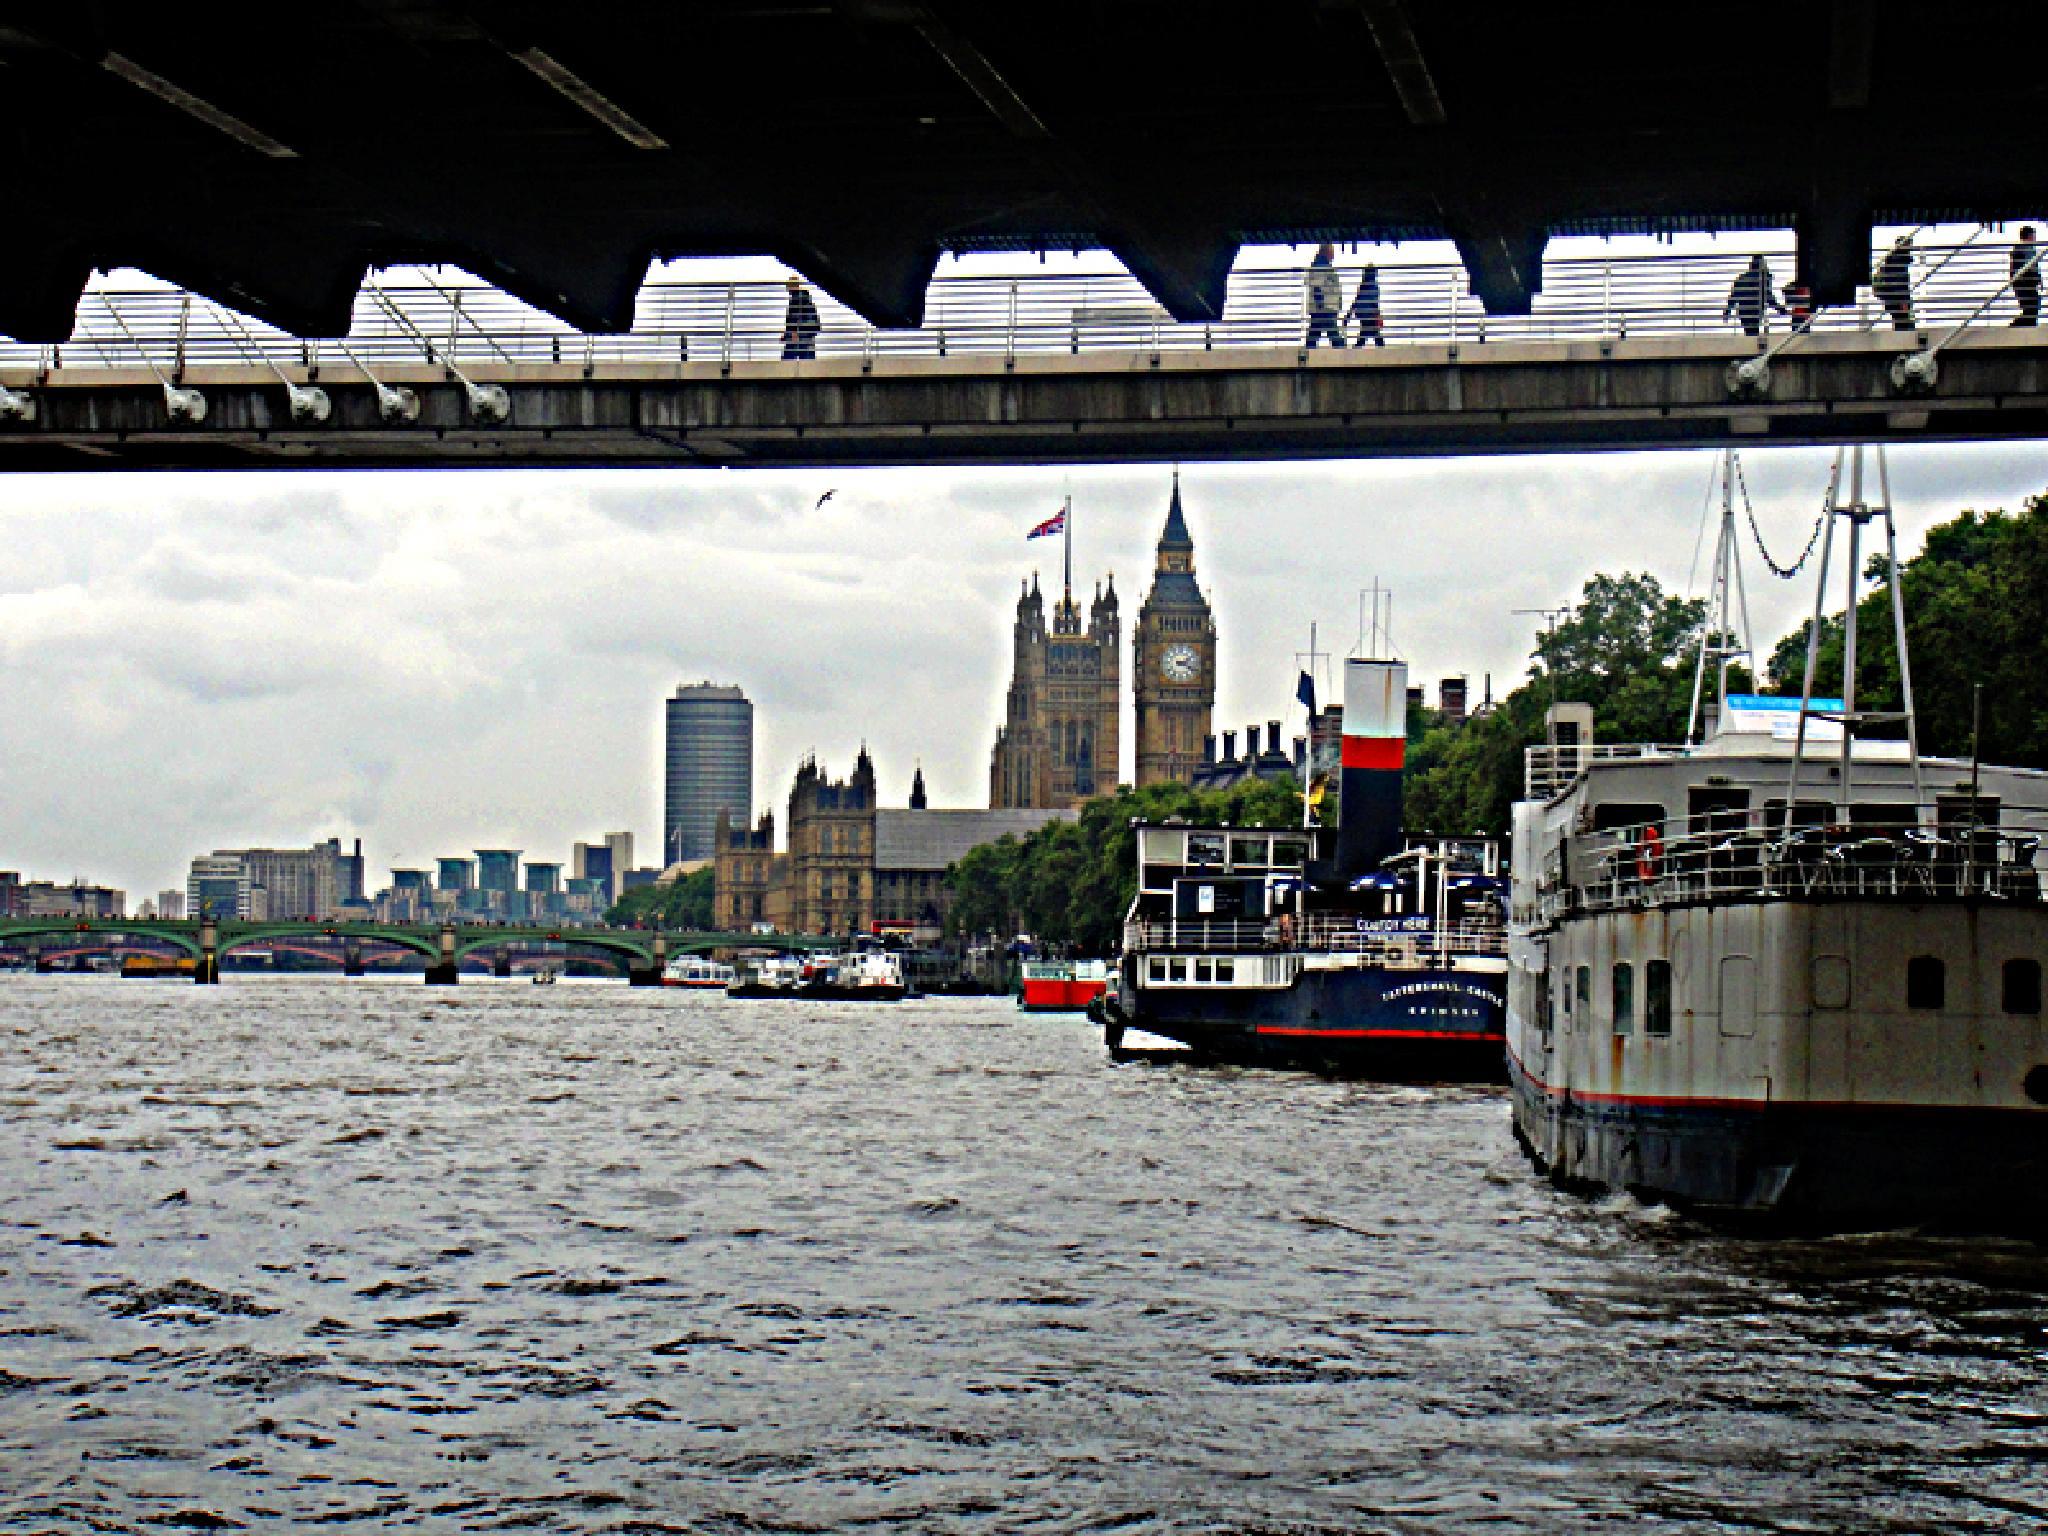 London alternative view by apoevans